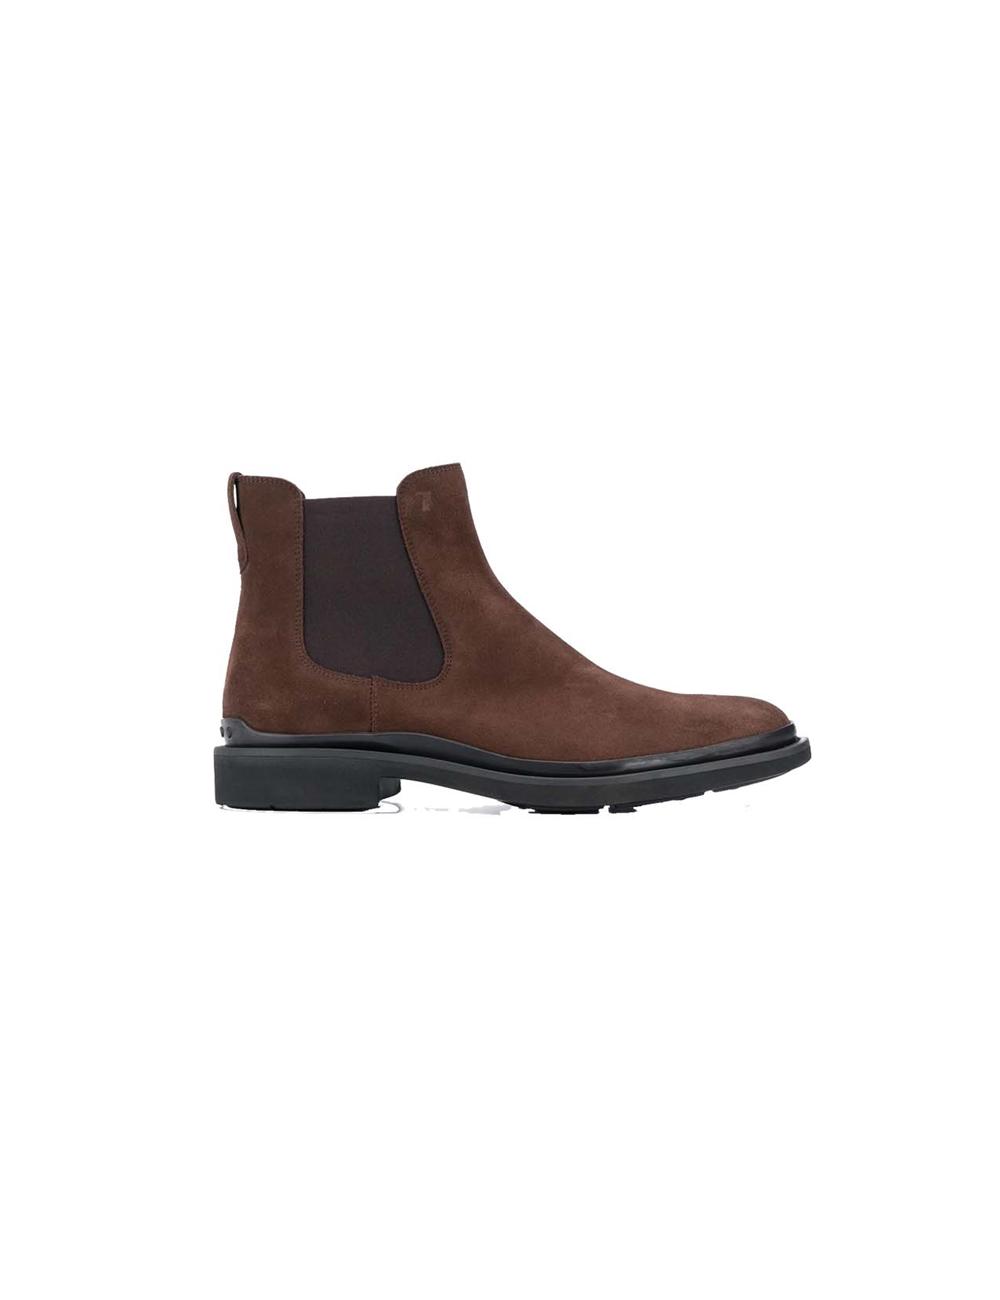 Man chelsea boots Tod's - BIG BOSS MEGEVE